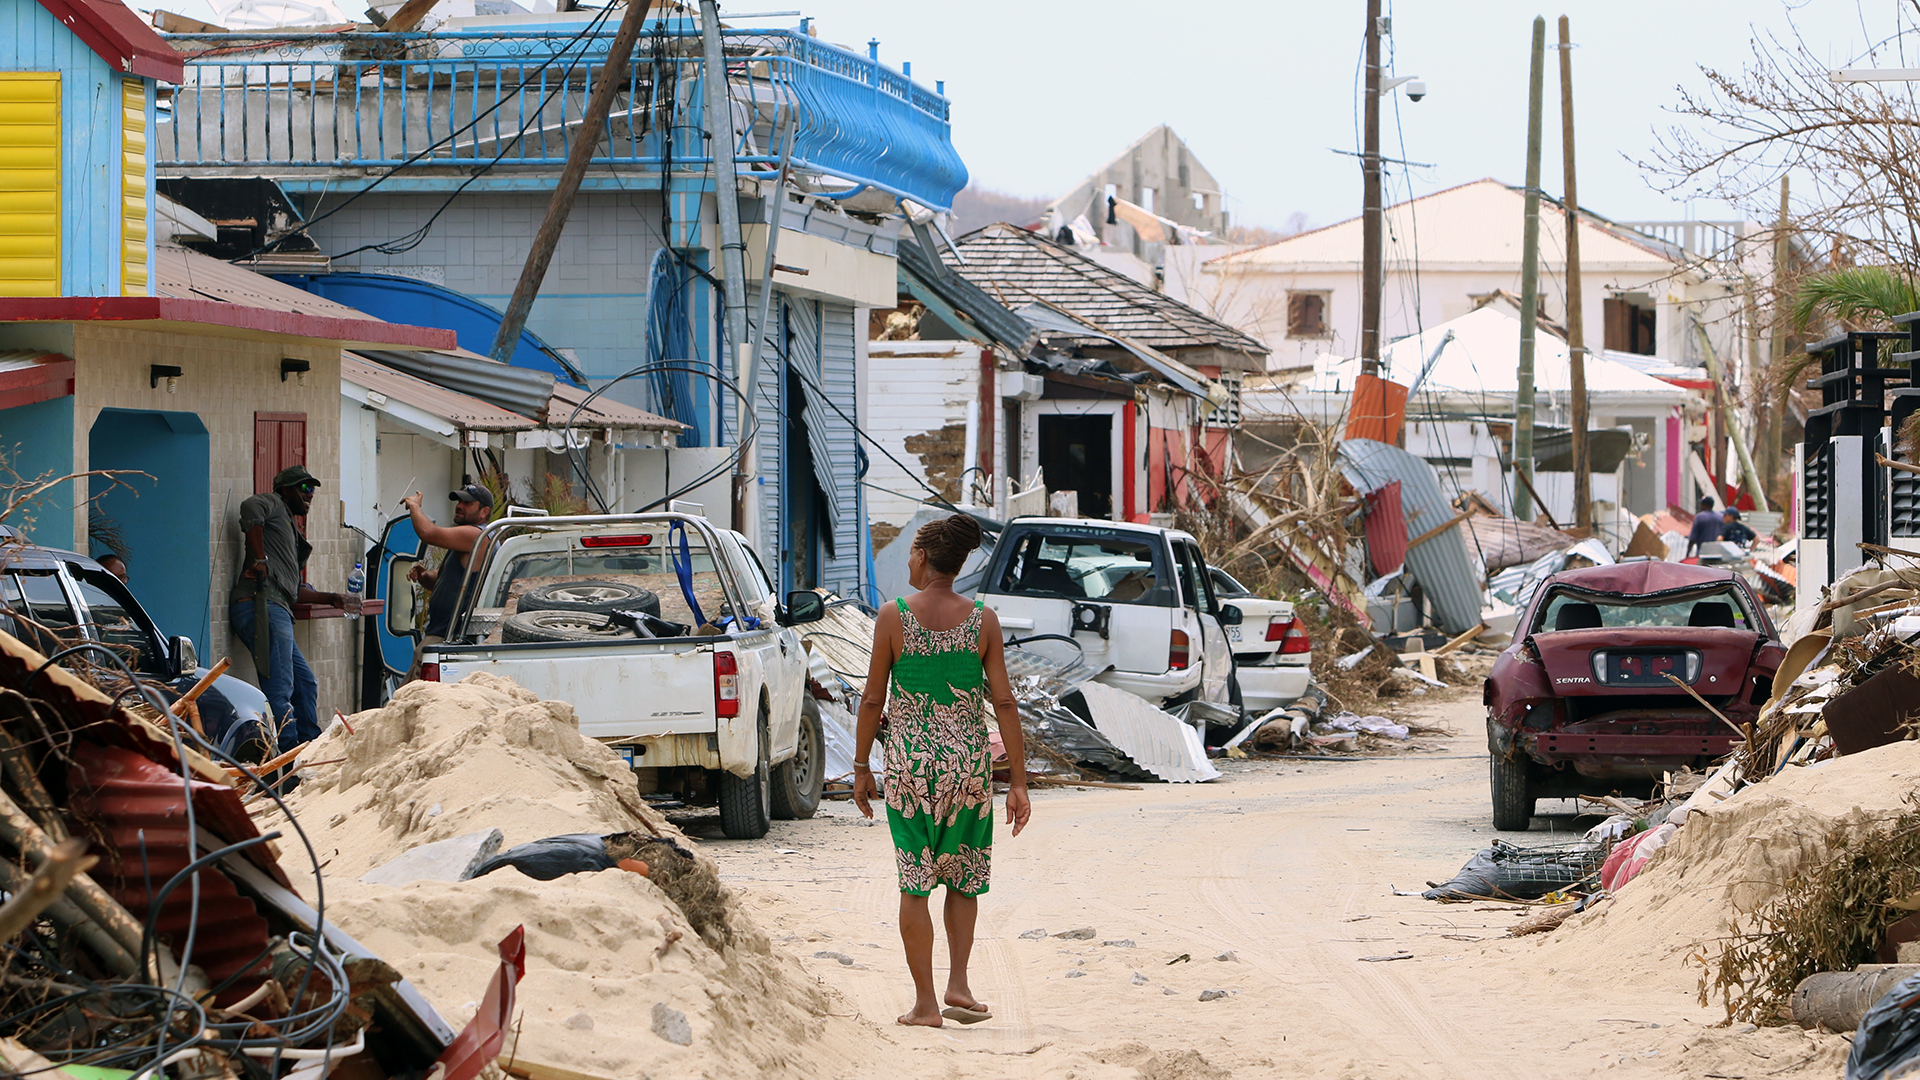 Saint Marteen Irma damage-159532.jpg17273545